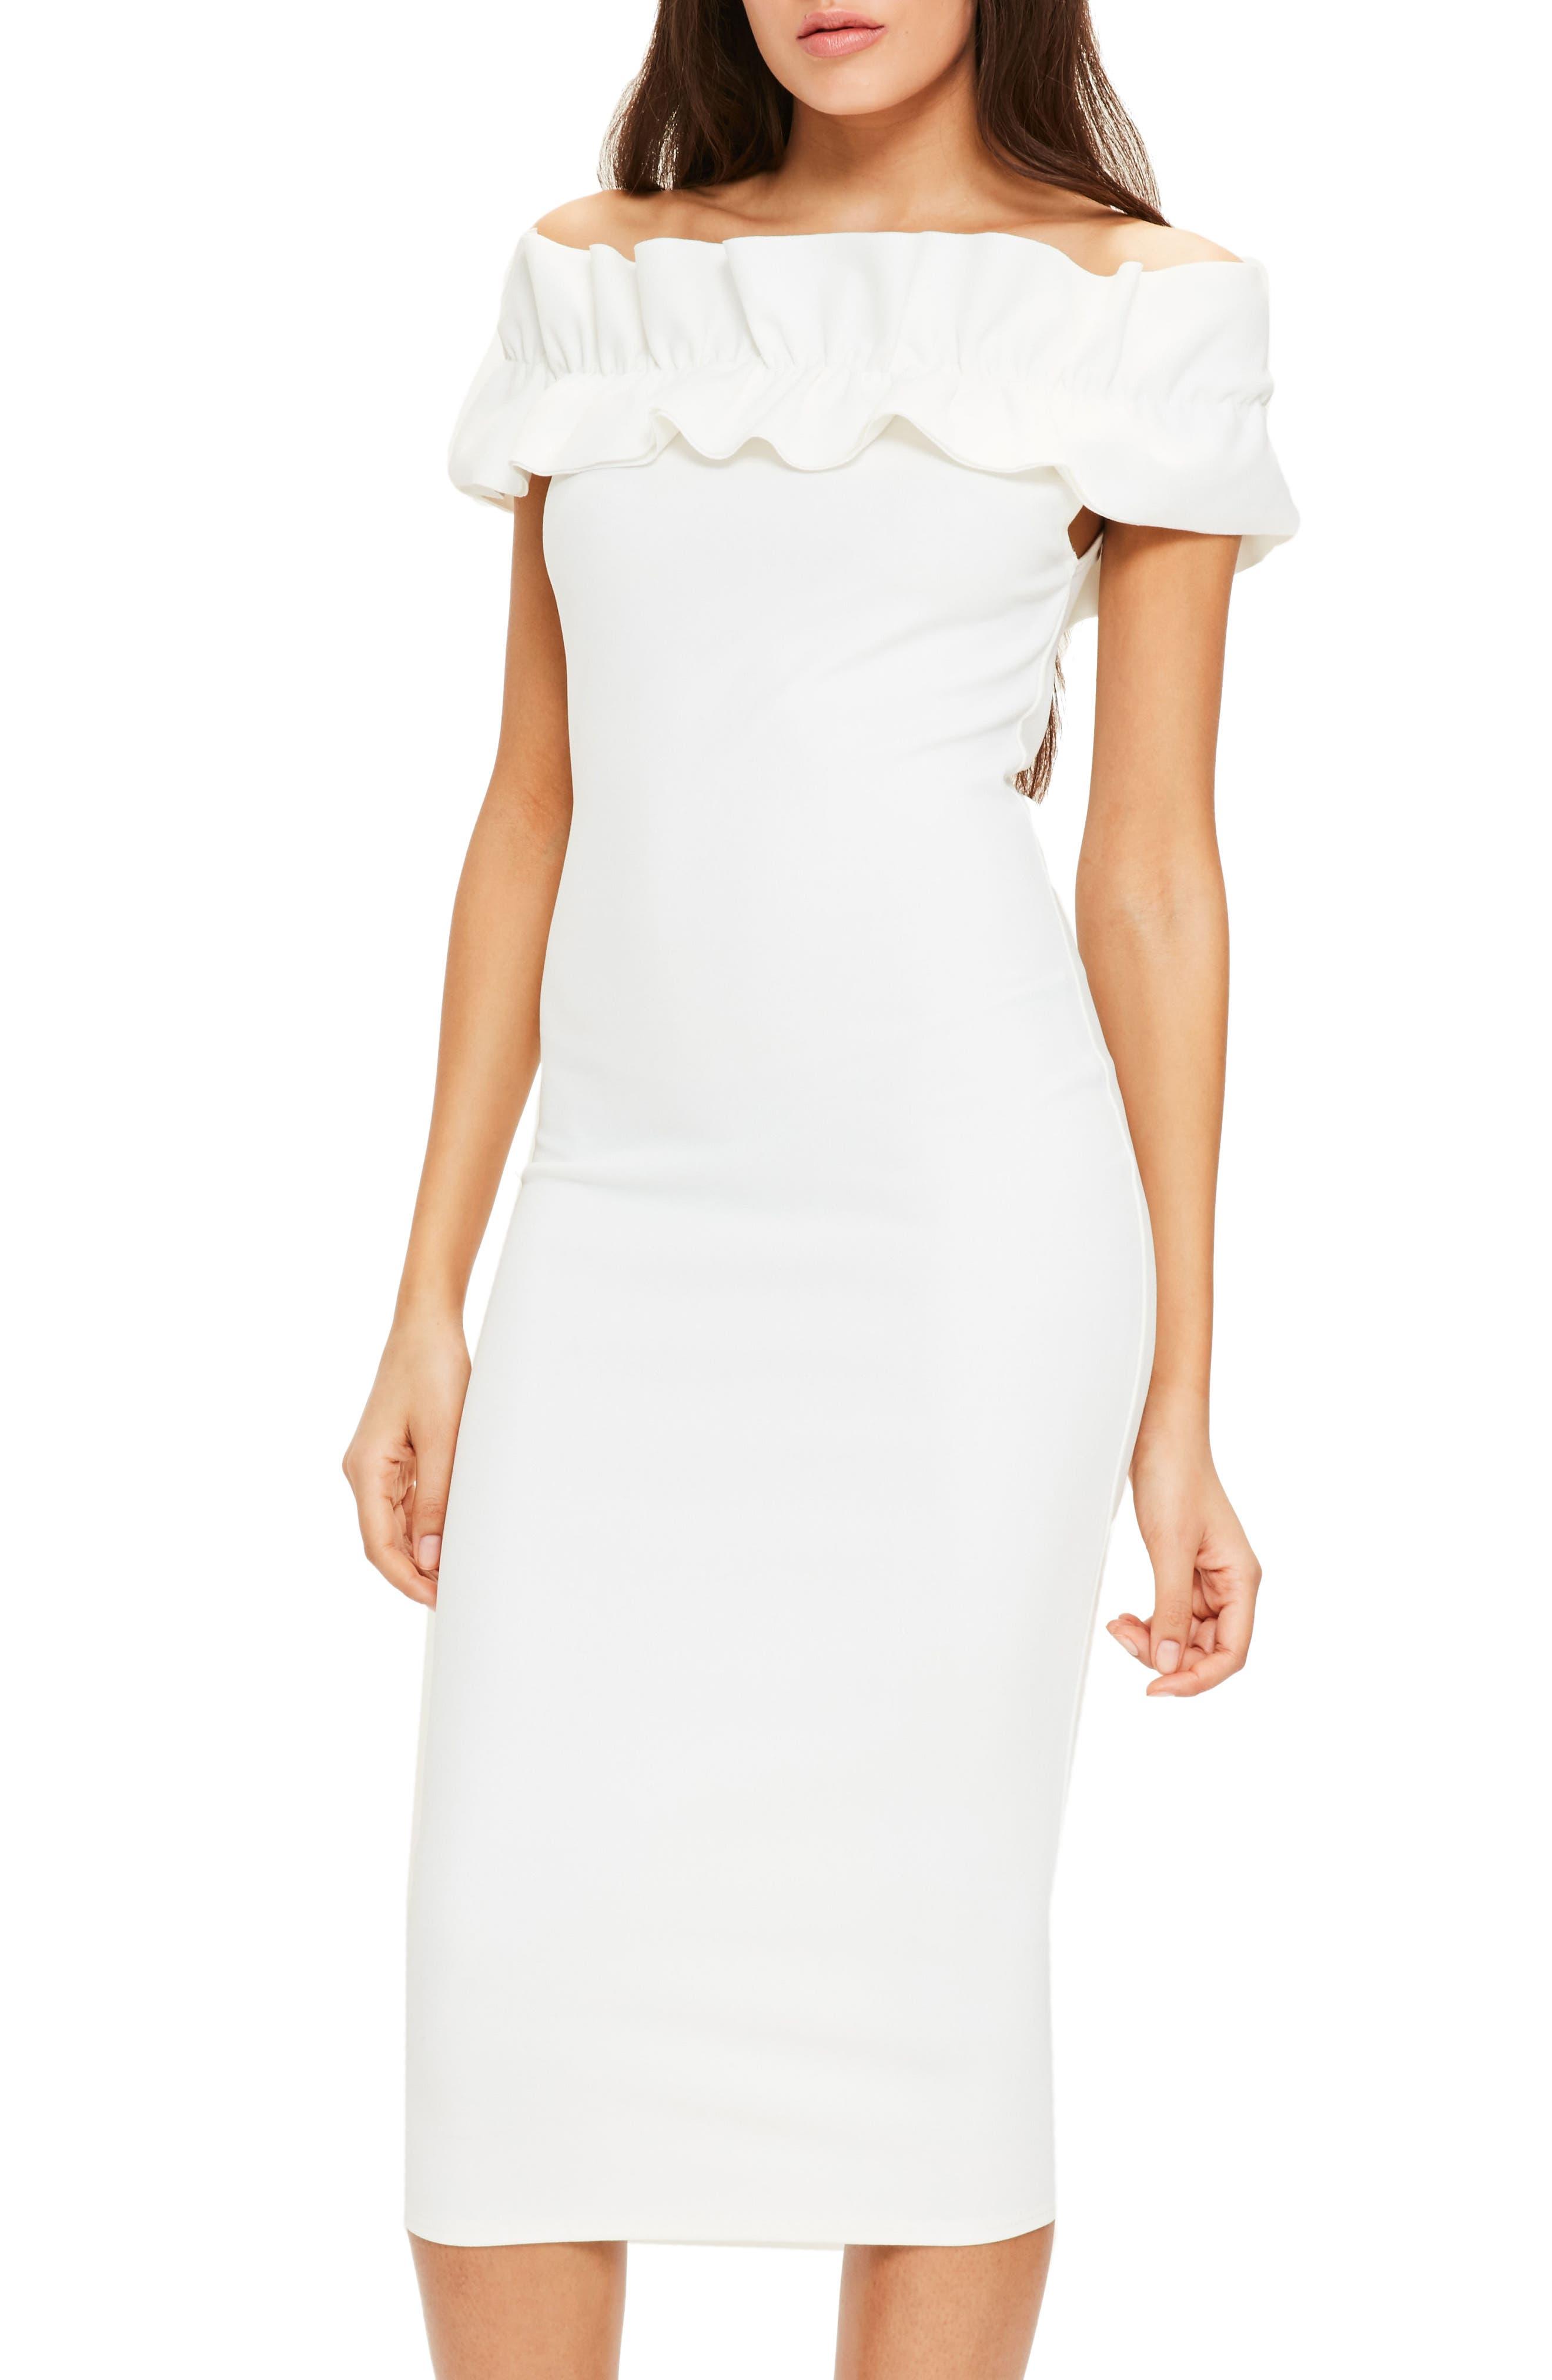 Main Image - Missguided Bardot Off the Shoulder Dress